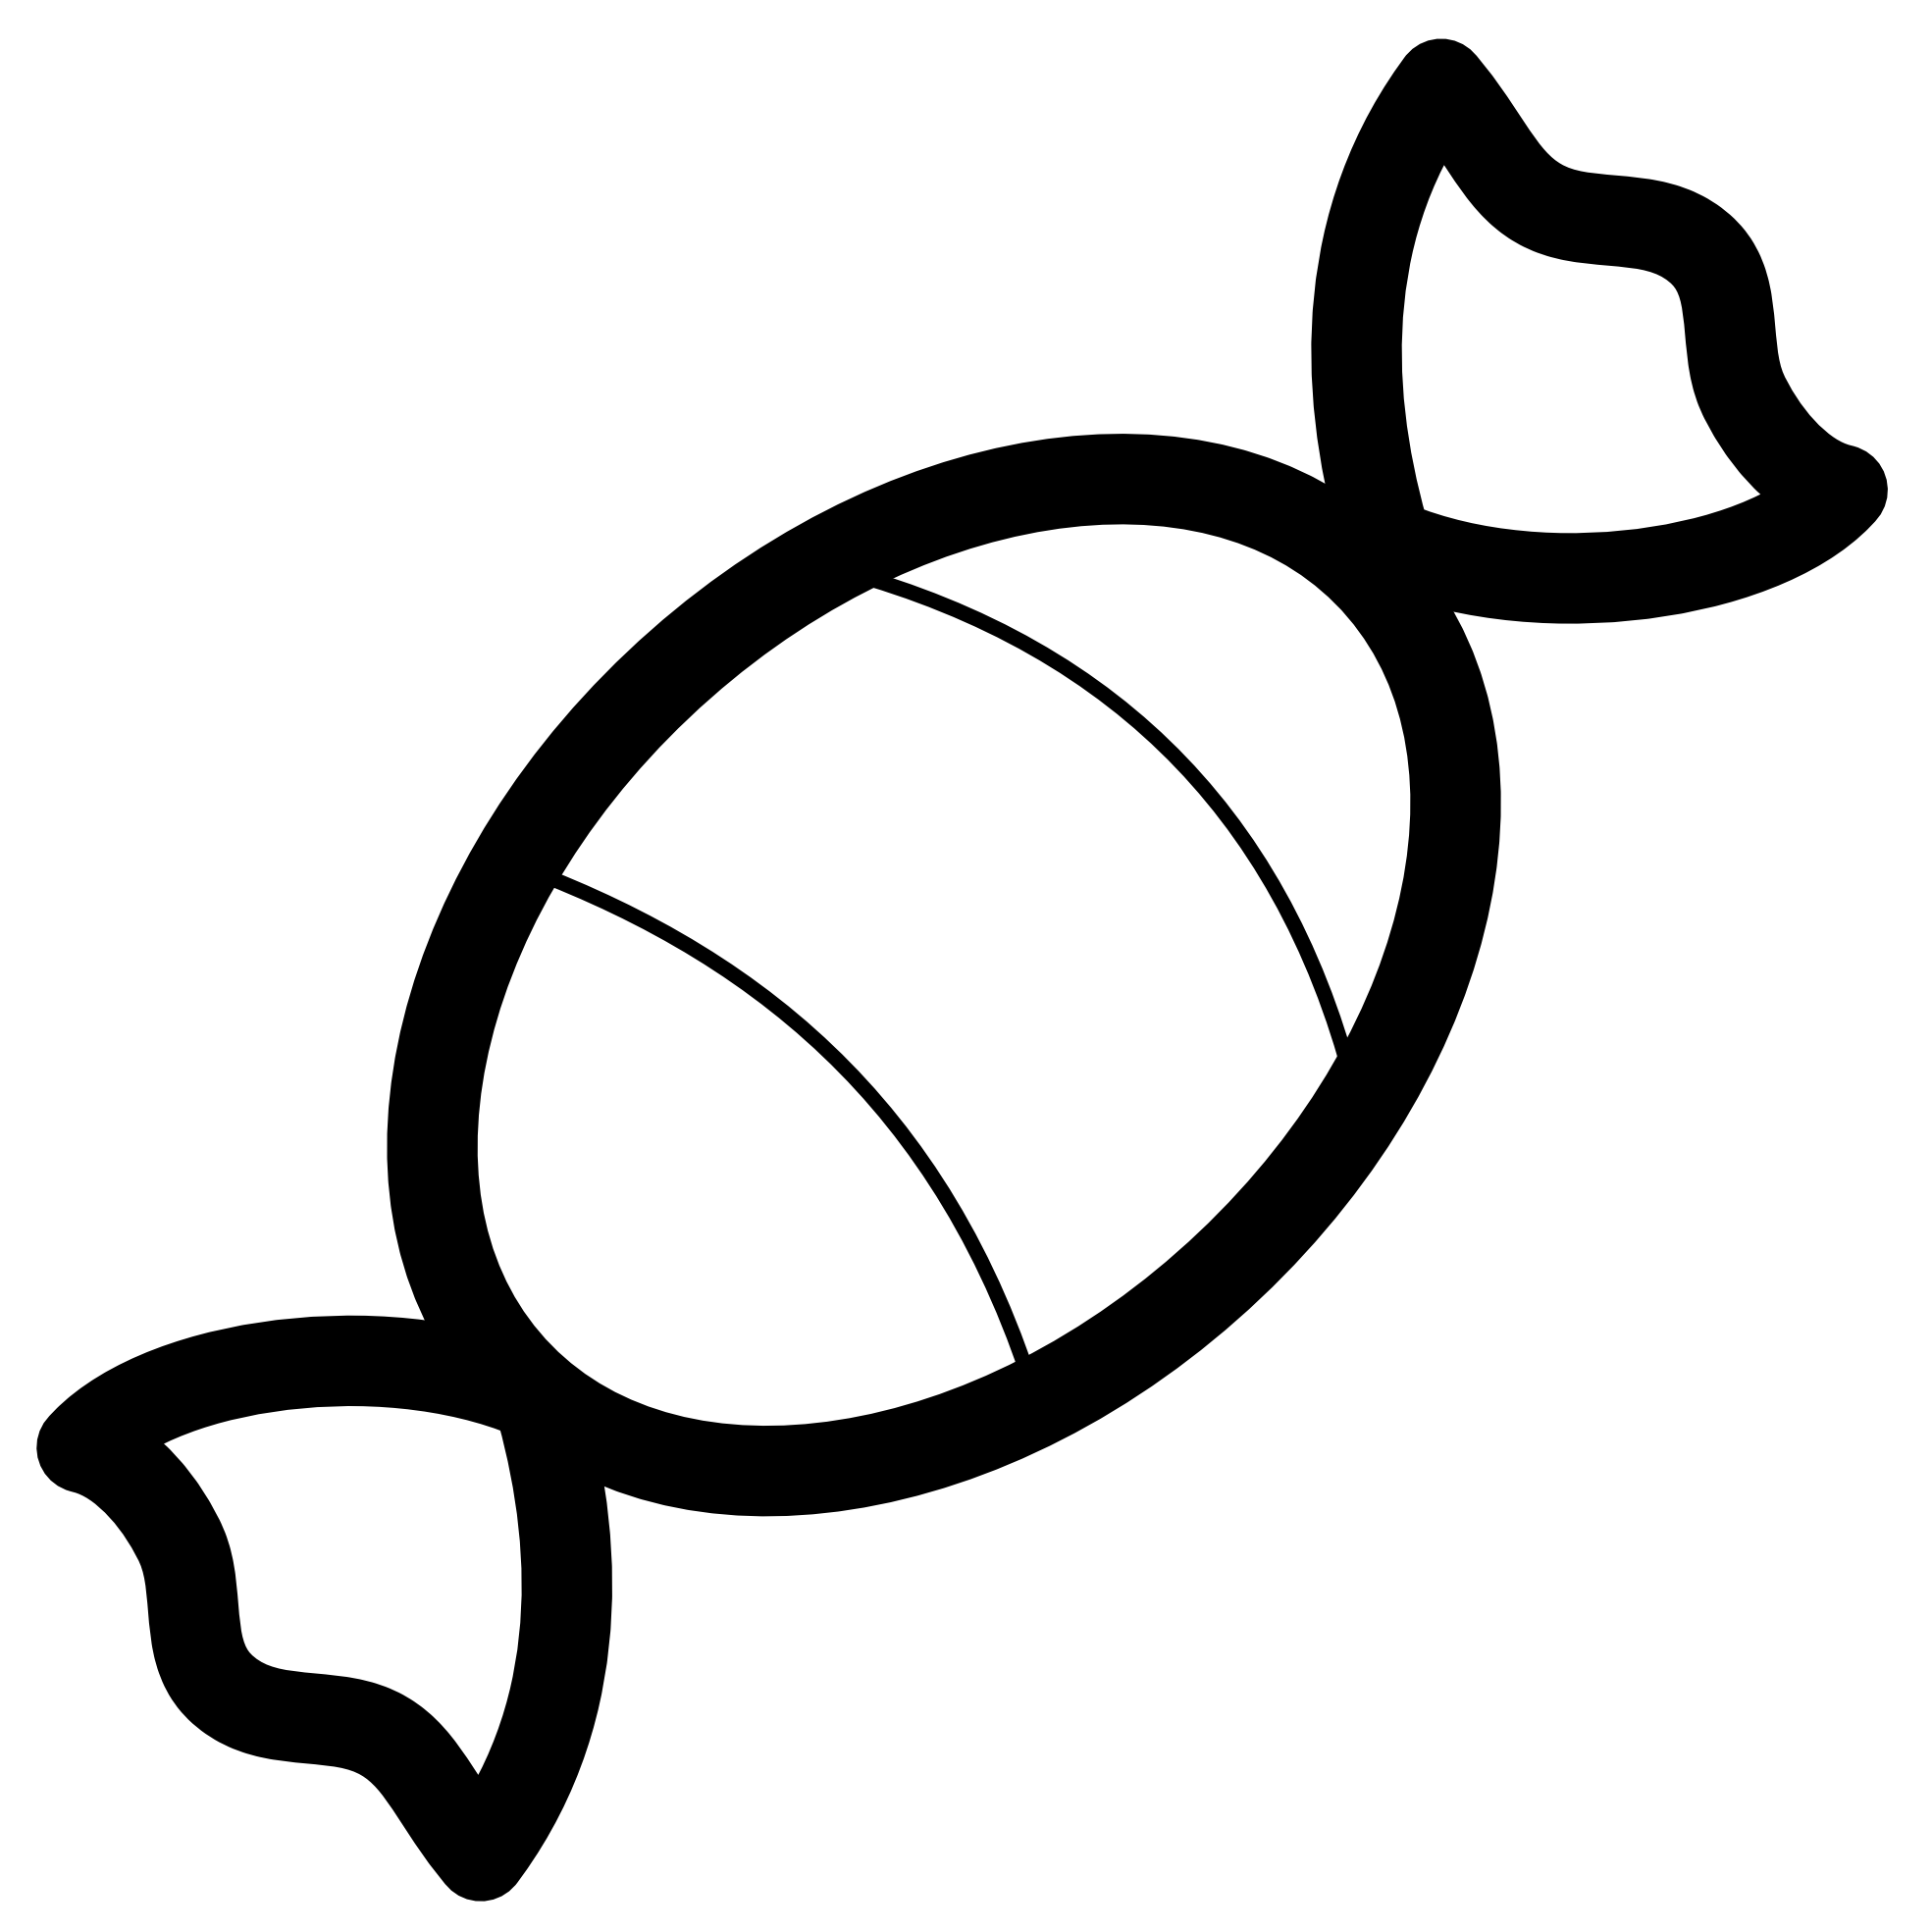 Candy Corn Clip Art Black And White.